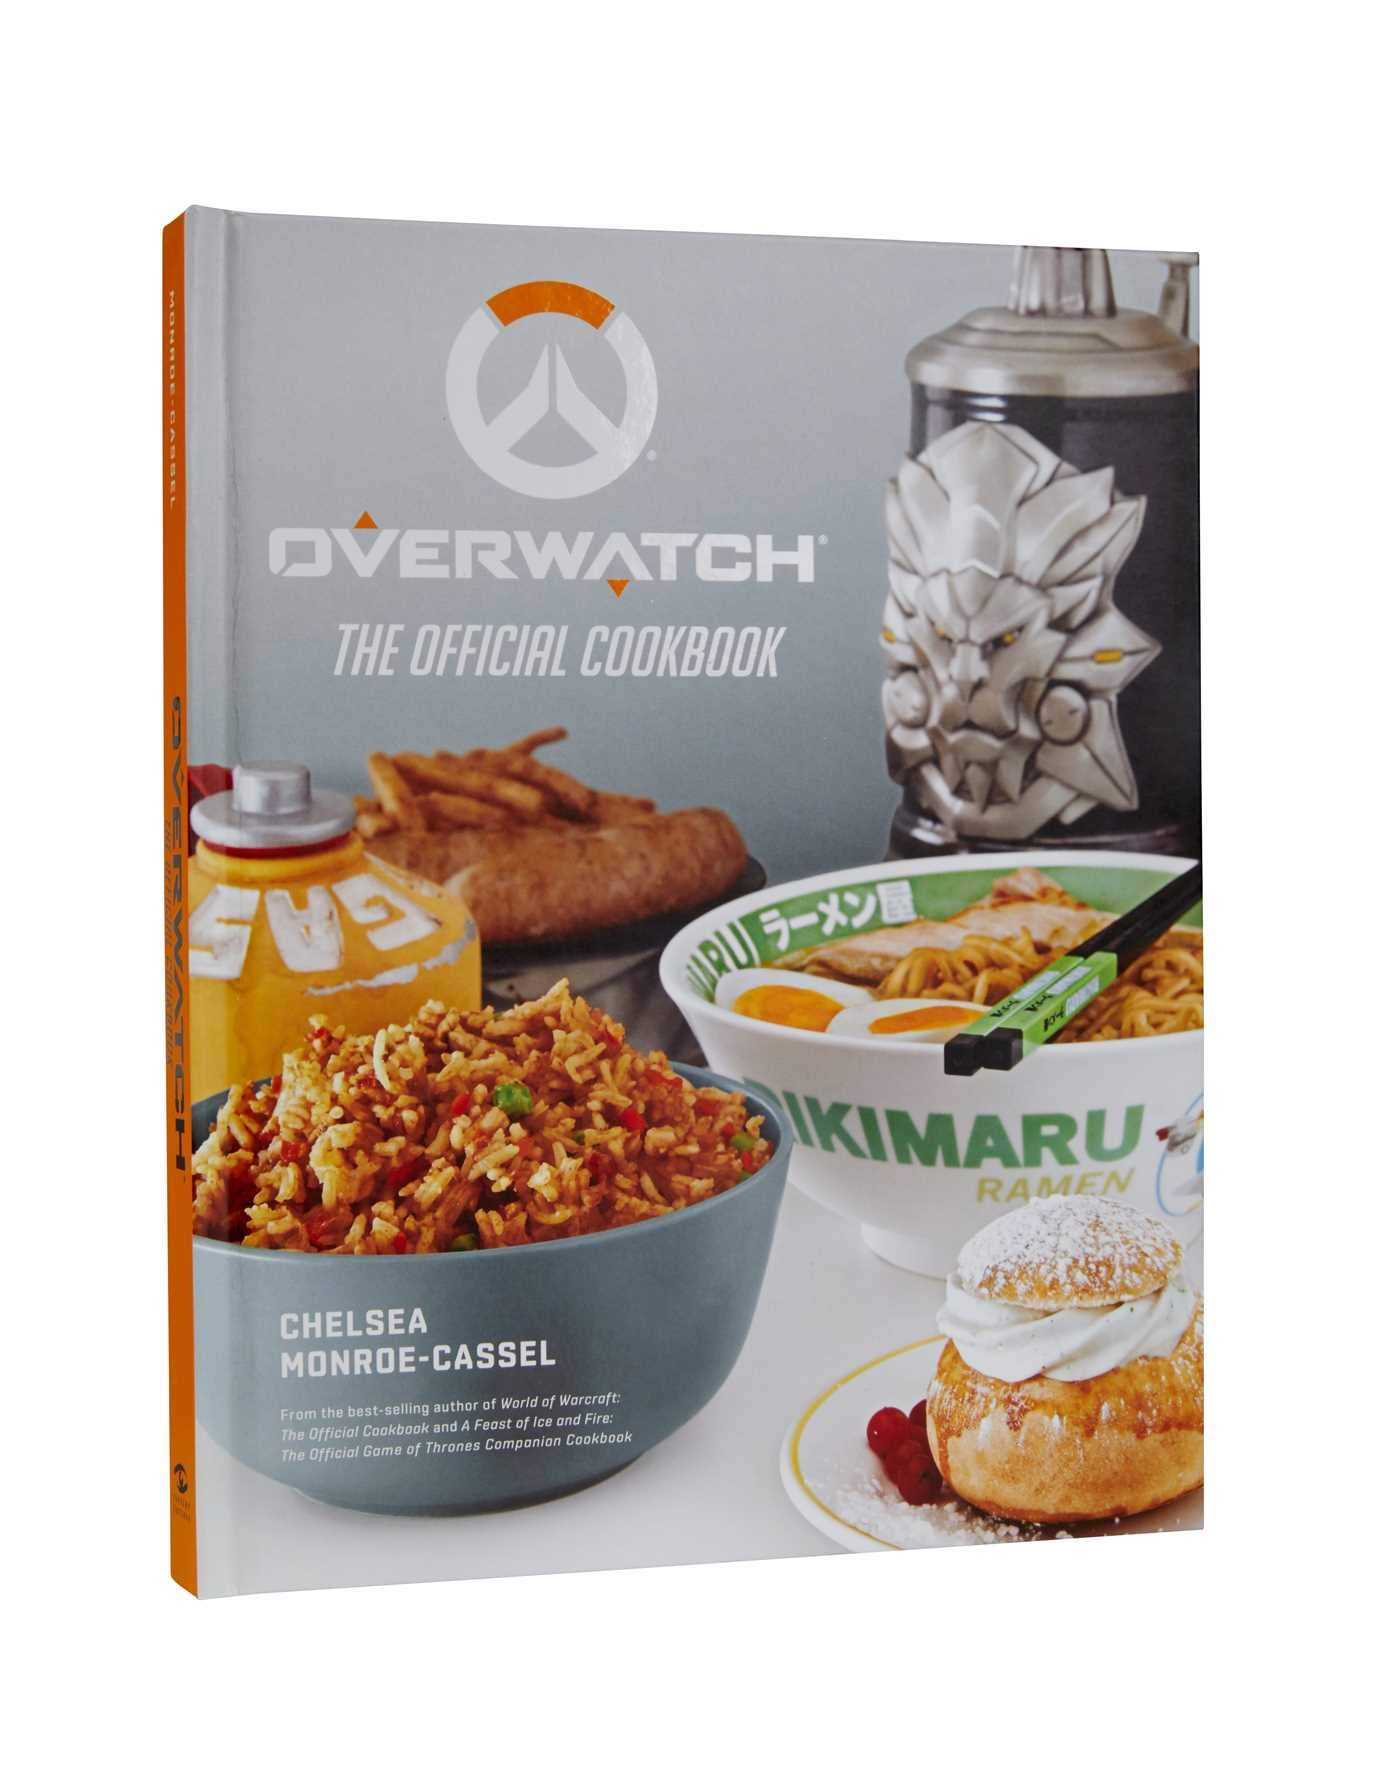 Overwatch: The Official Cookbook: Amazon.es: Monroe-Cassel ...